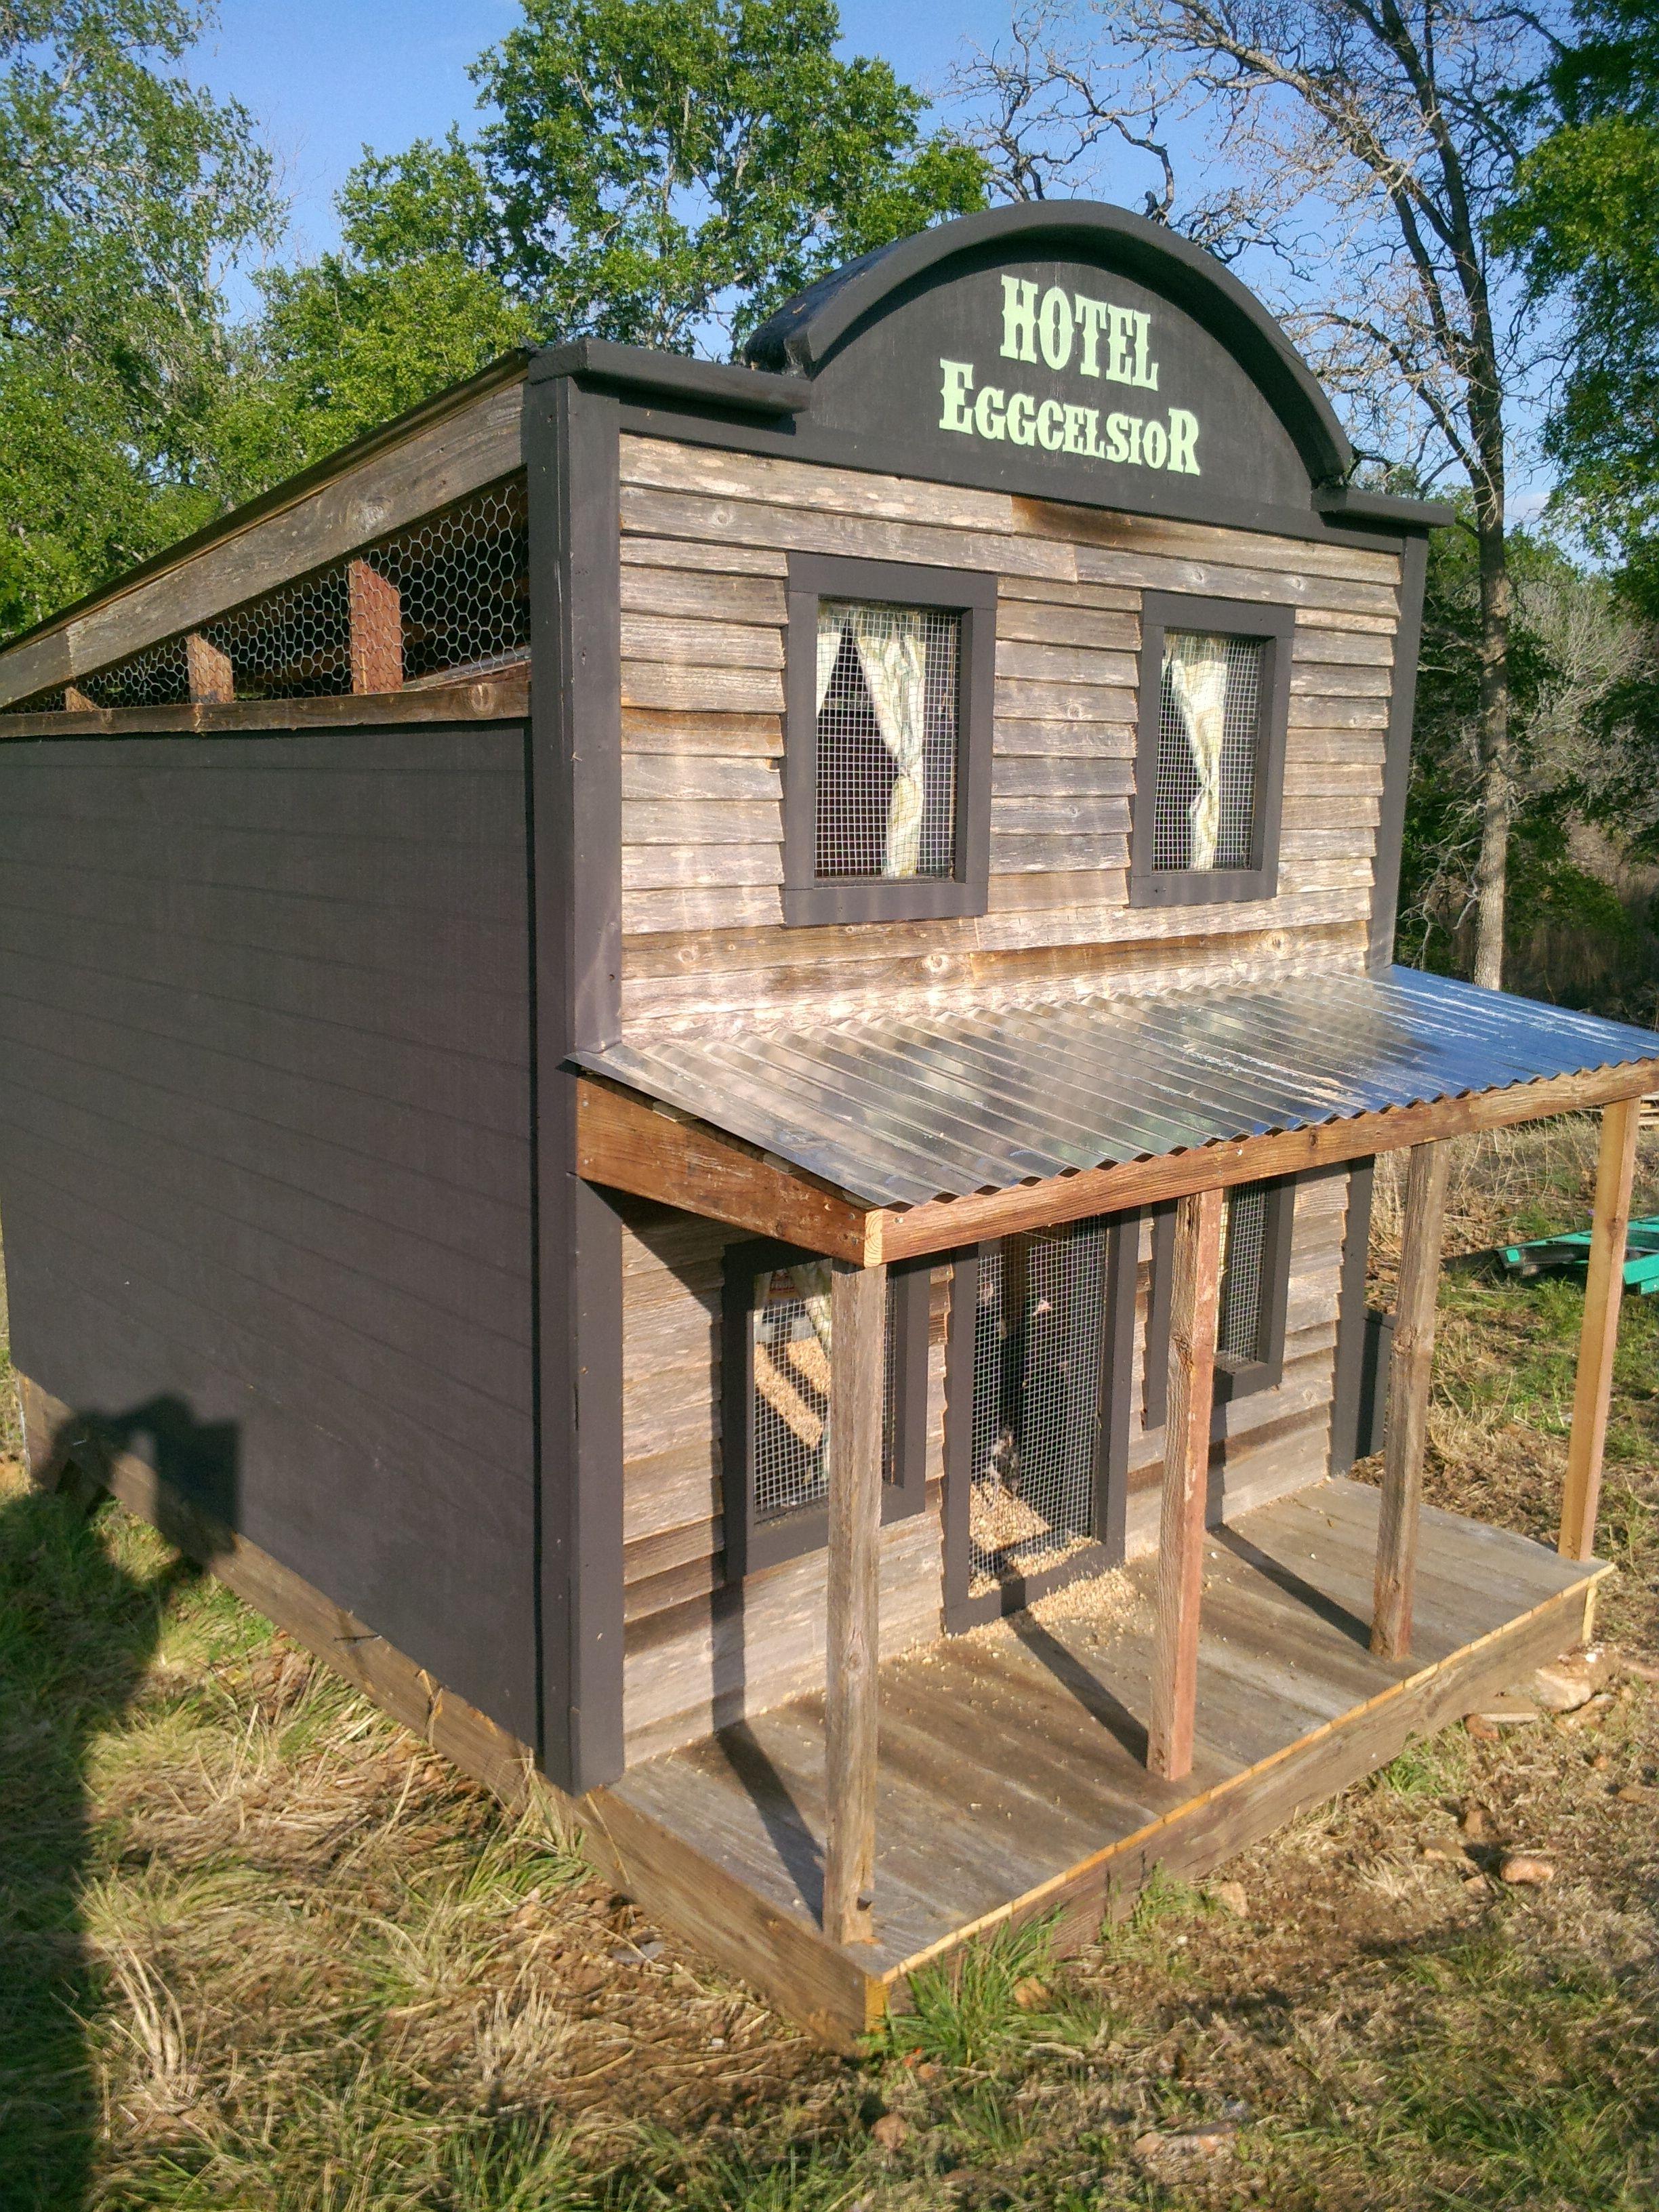 Backyard Chicken Coop Plans Backyard Chicken Coops: Diy Chicken Coop Plans, Chickens Backyard, Chicken Diy